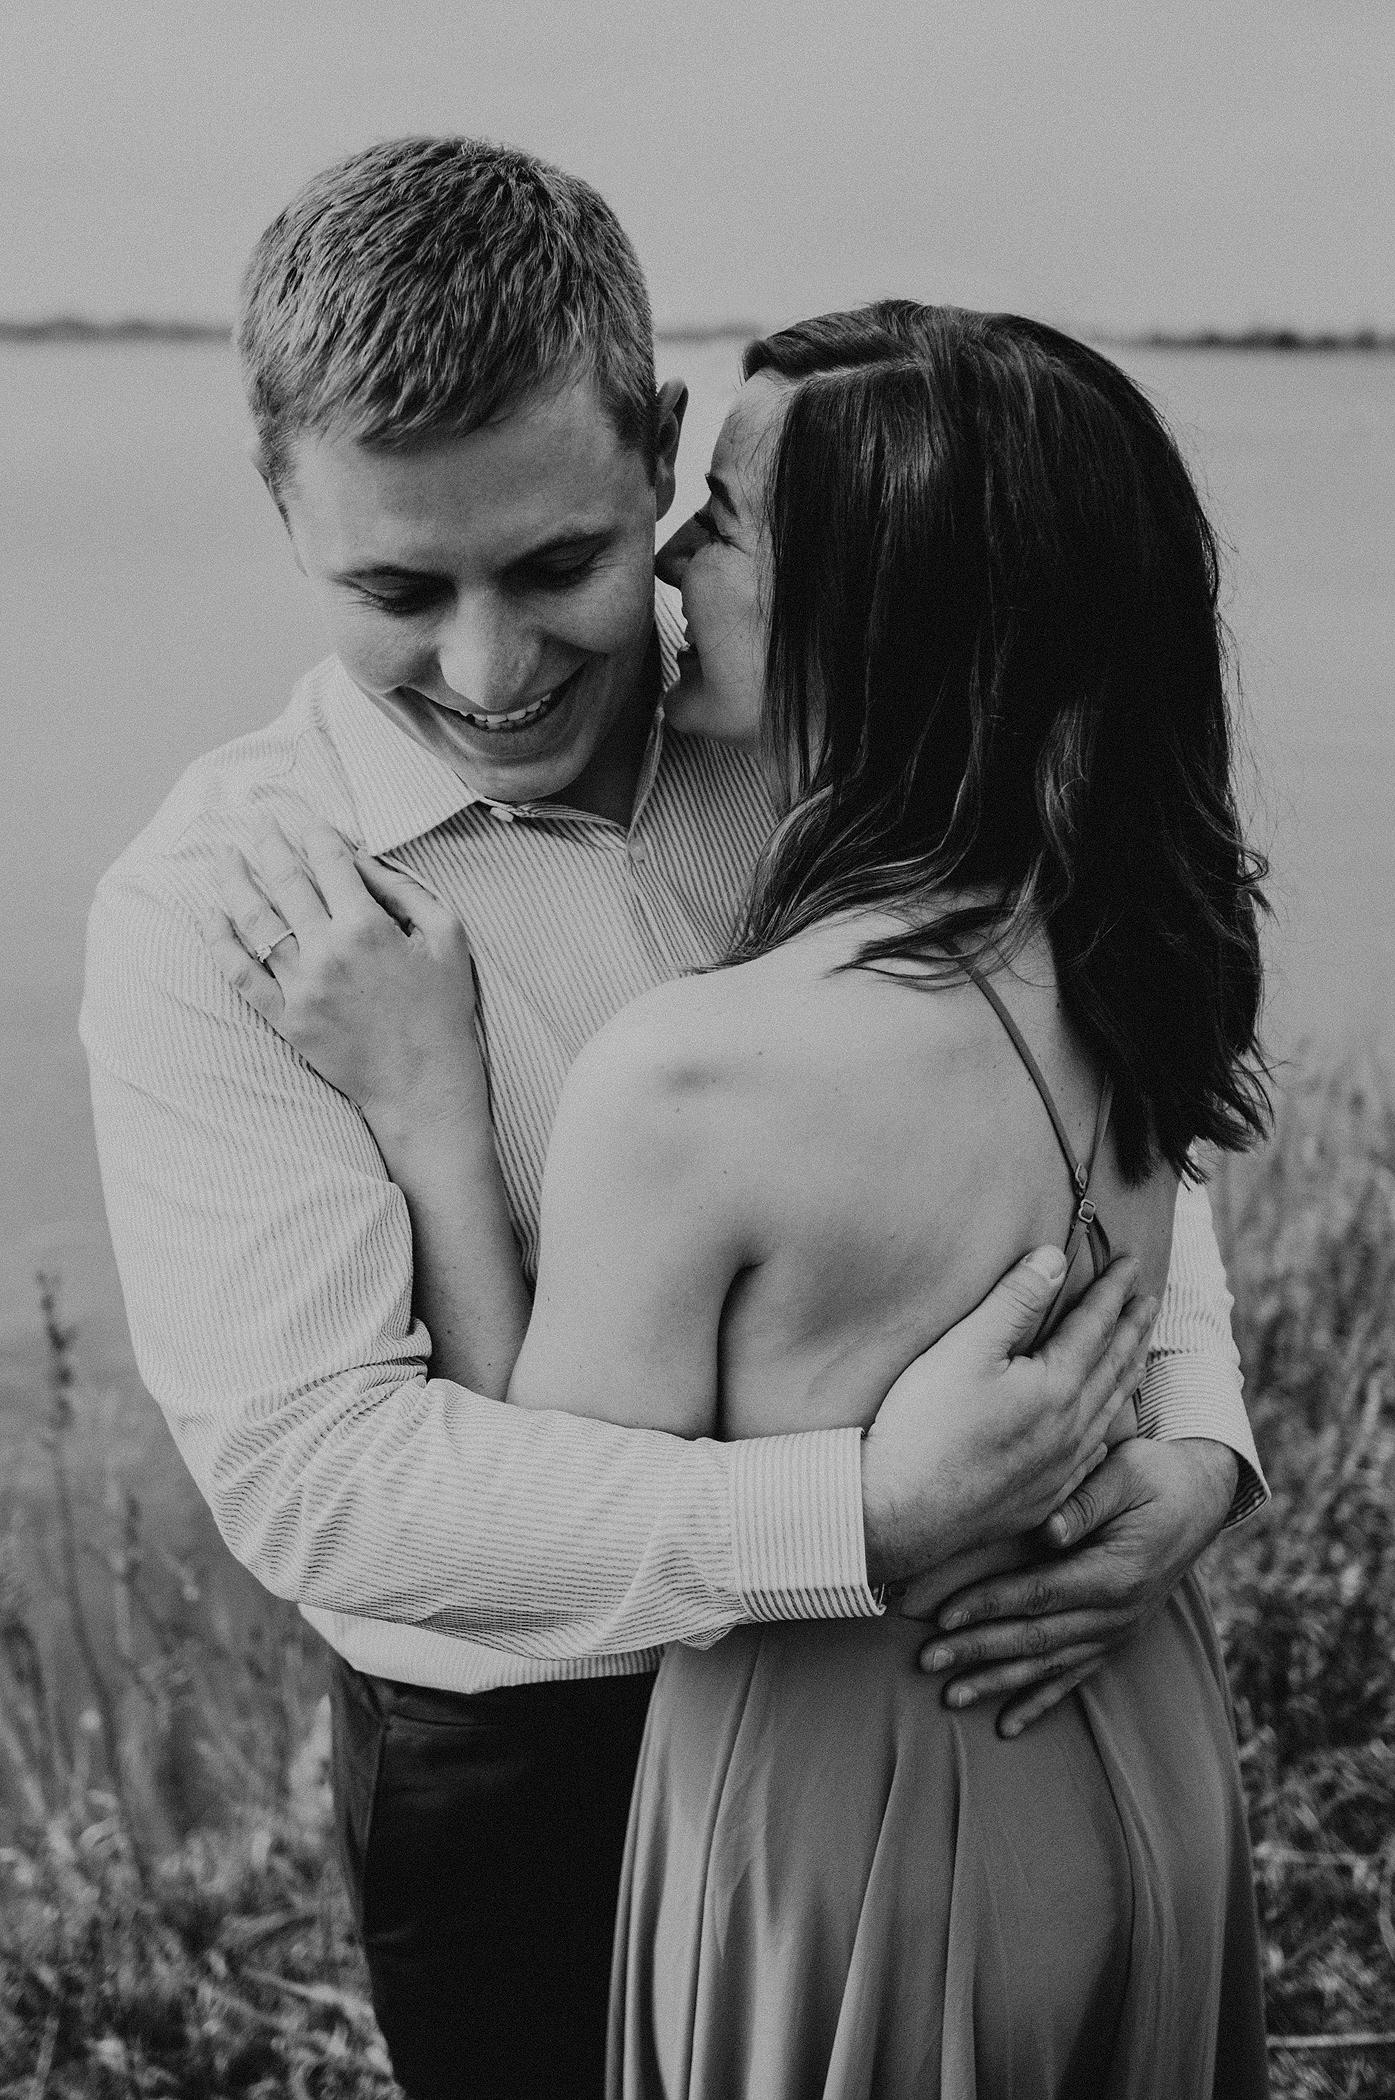 kaylie-sirek-nebraska-wedding-engagement-photographer-photography-grand-island-kearney-hastings-lincoln-07.png